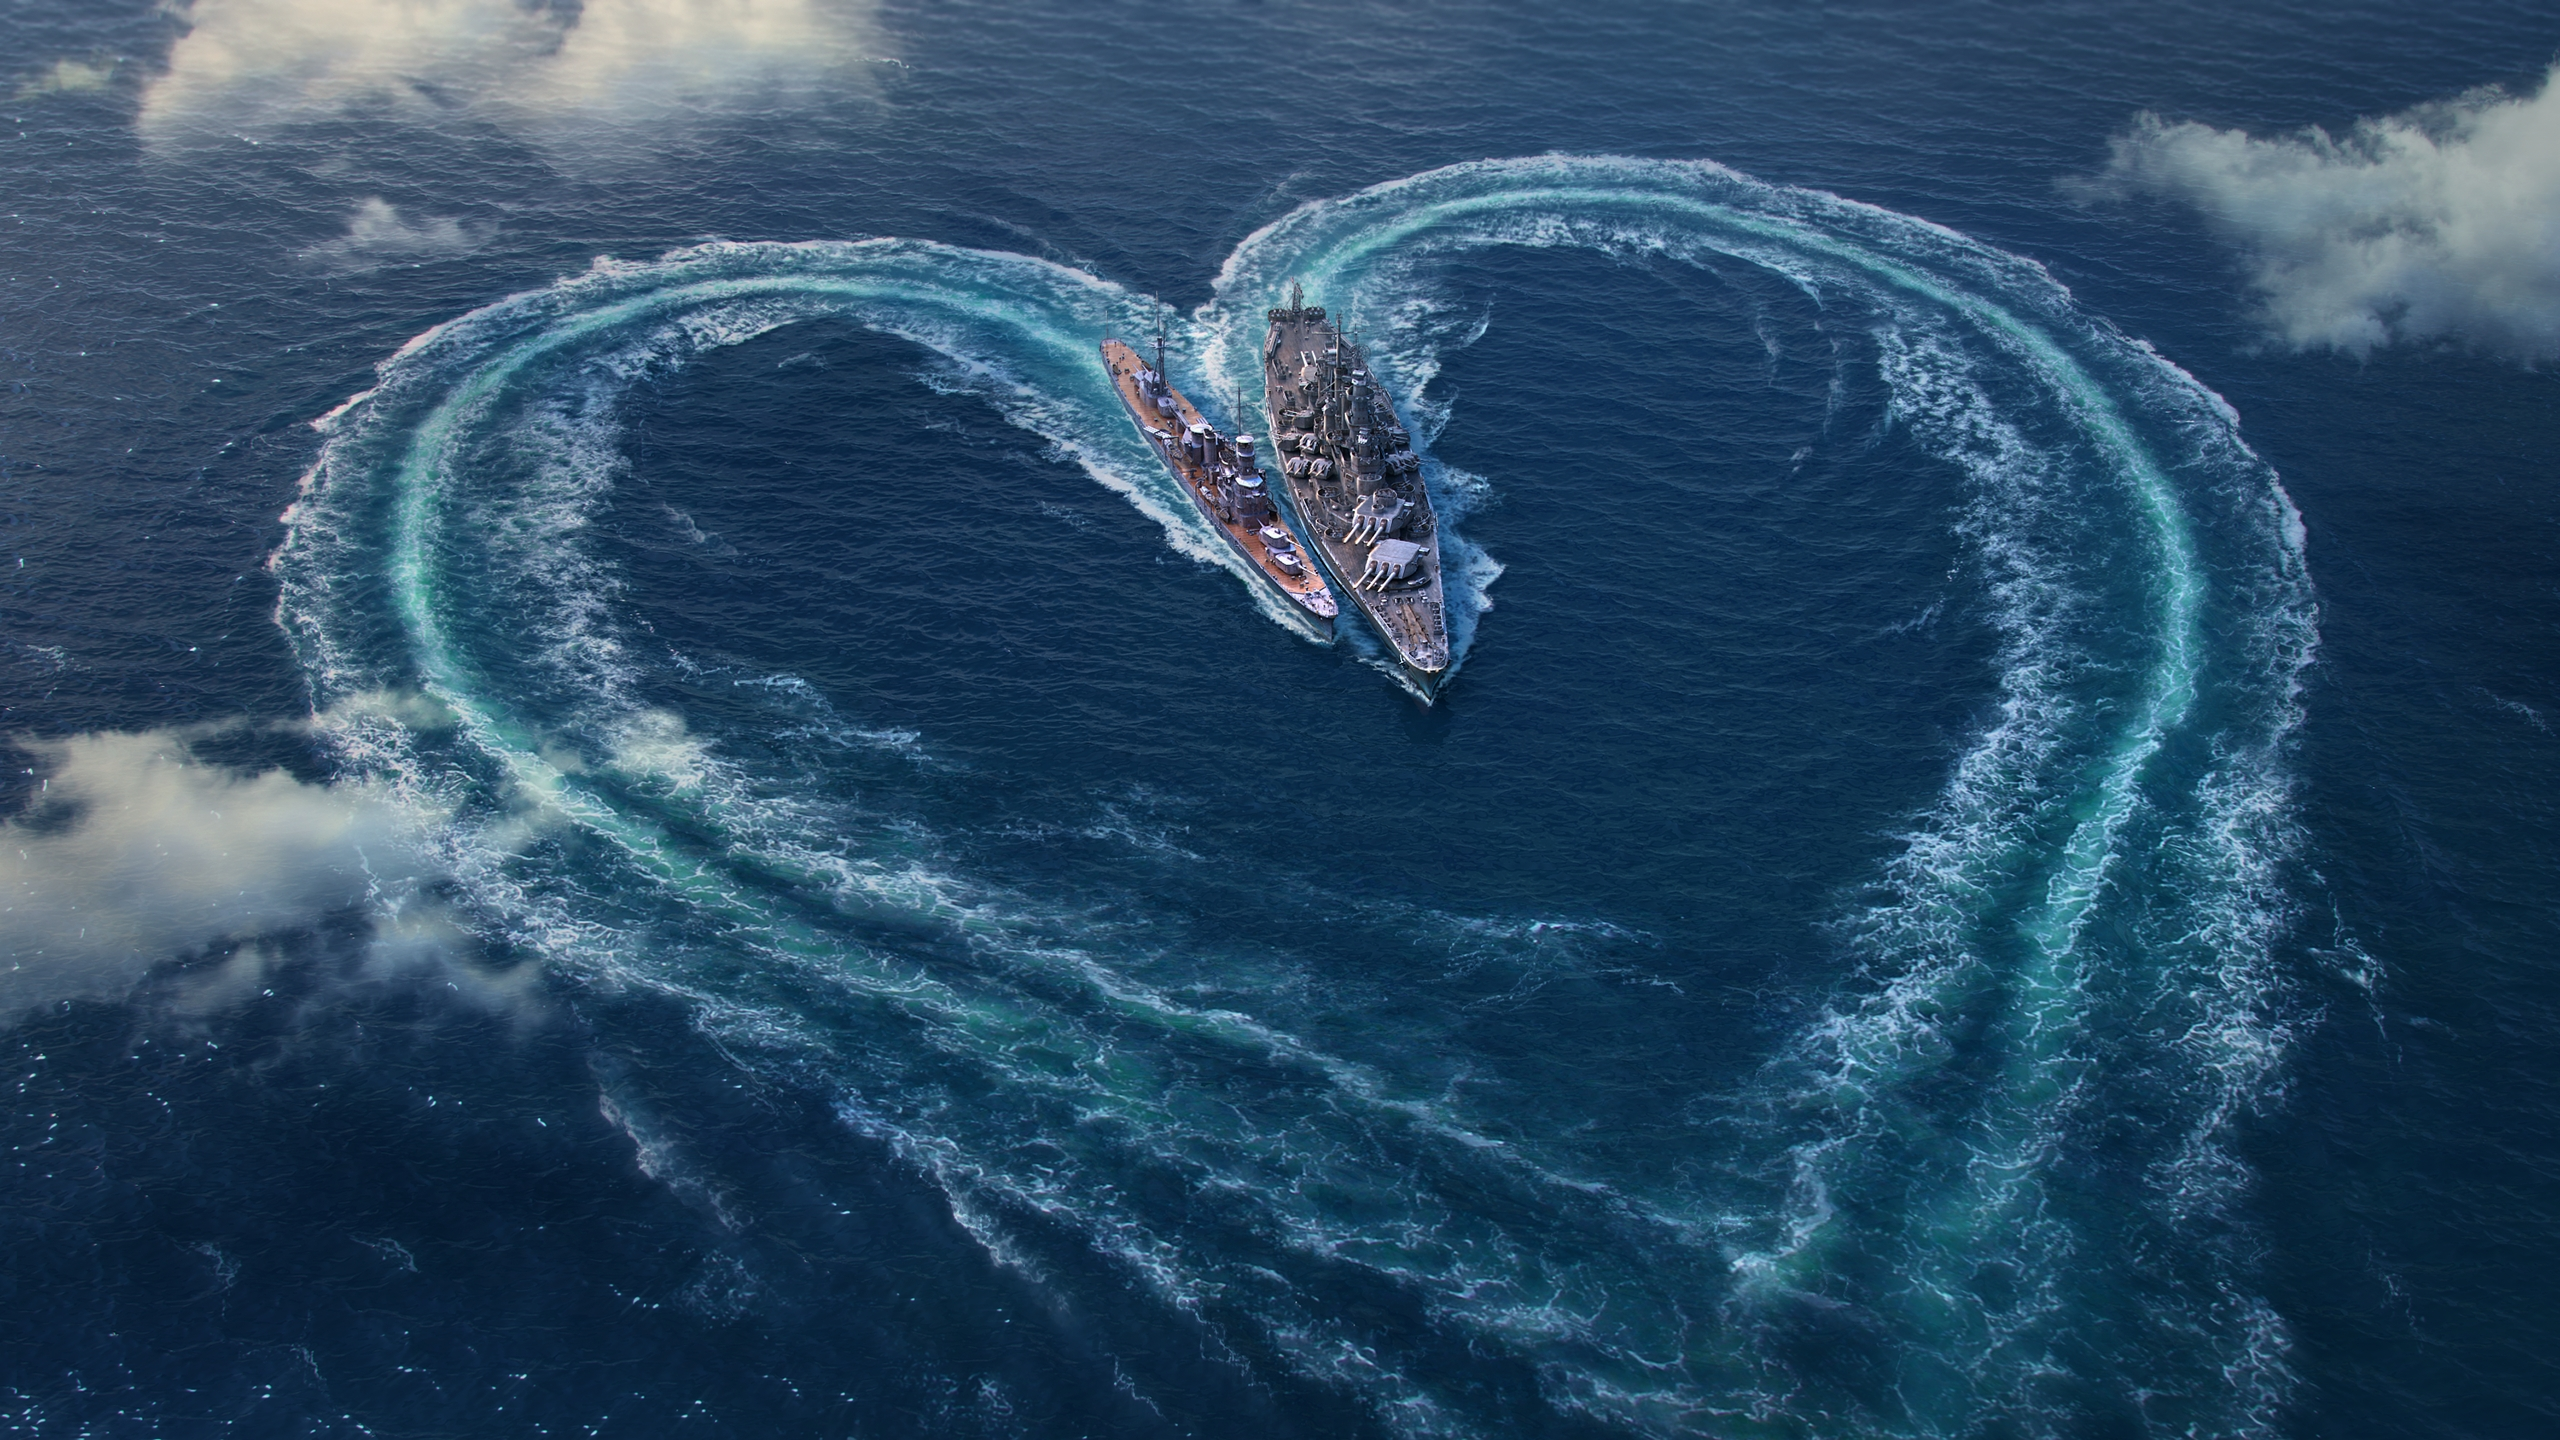 World Of Warships Wallpaper: World-of-warships-valentines-day-wallpaper